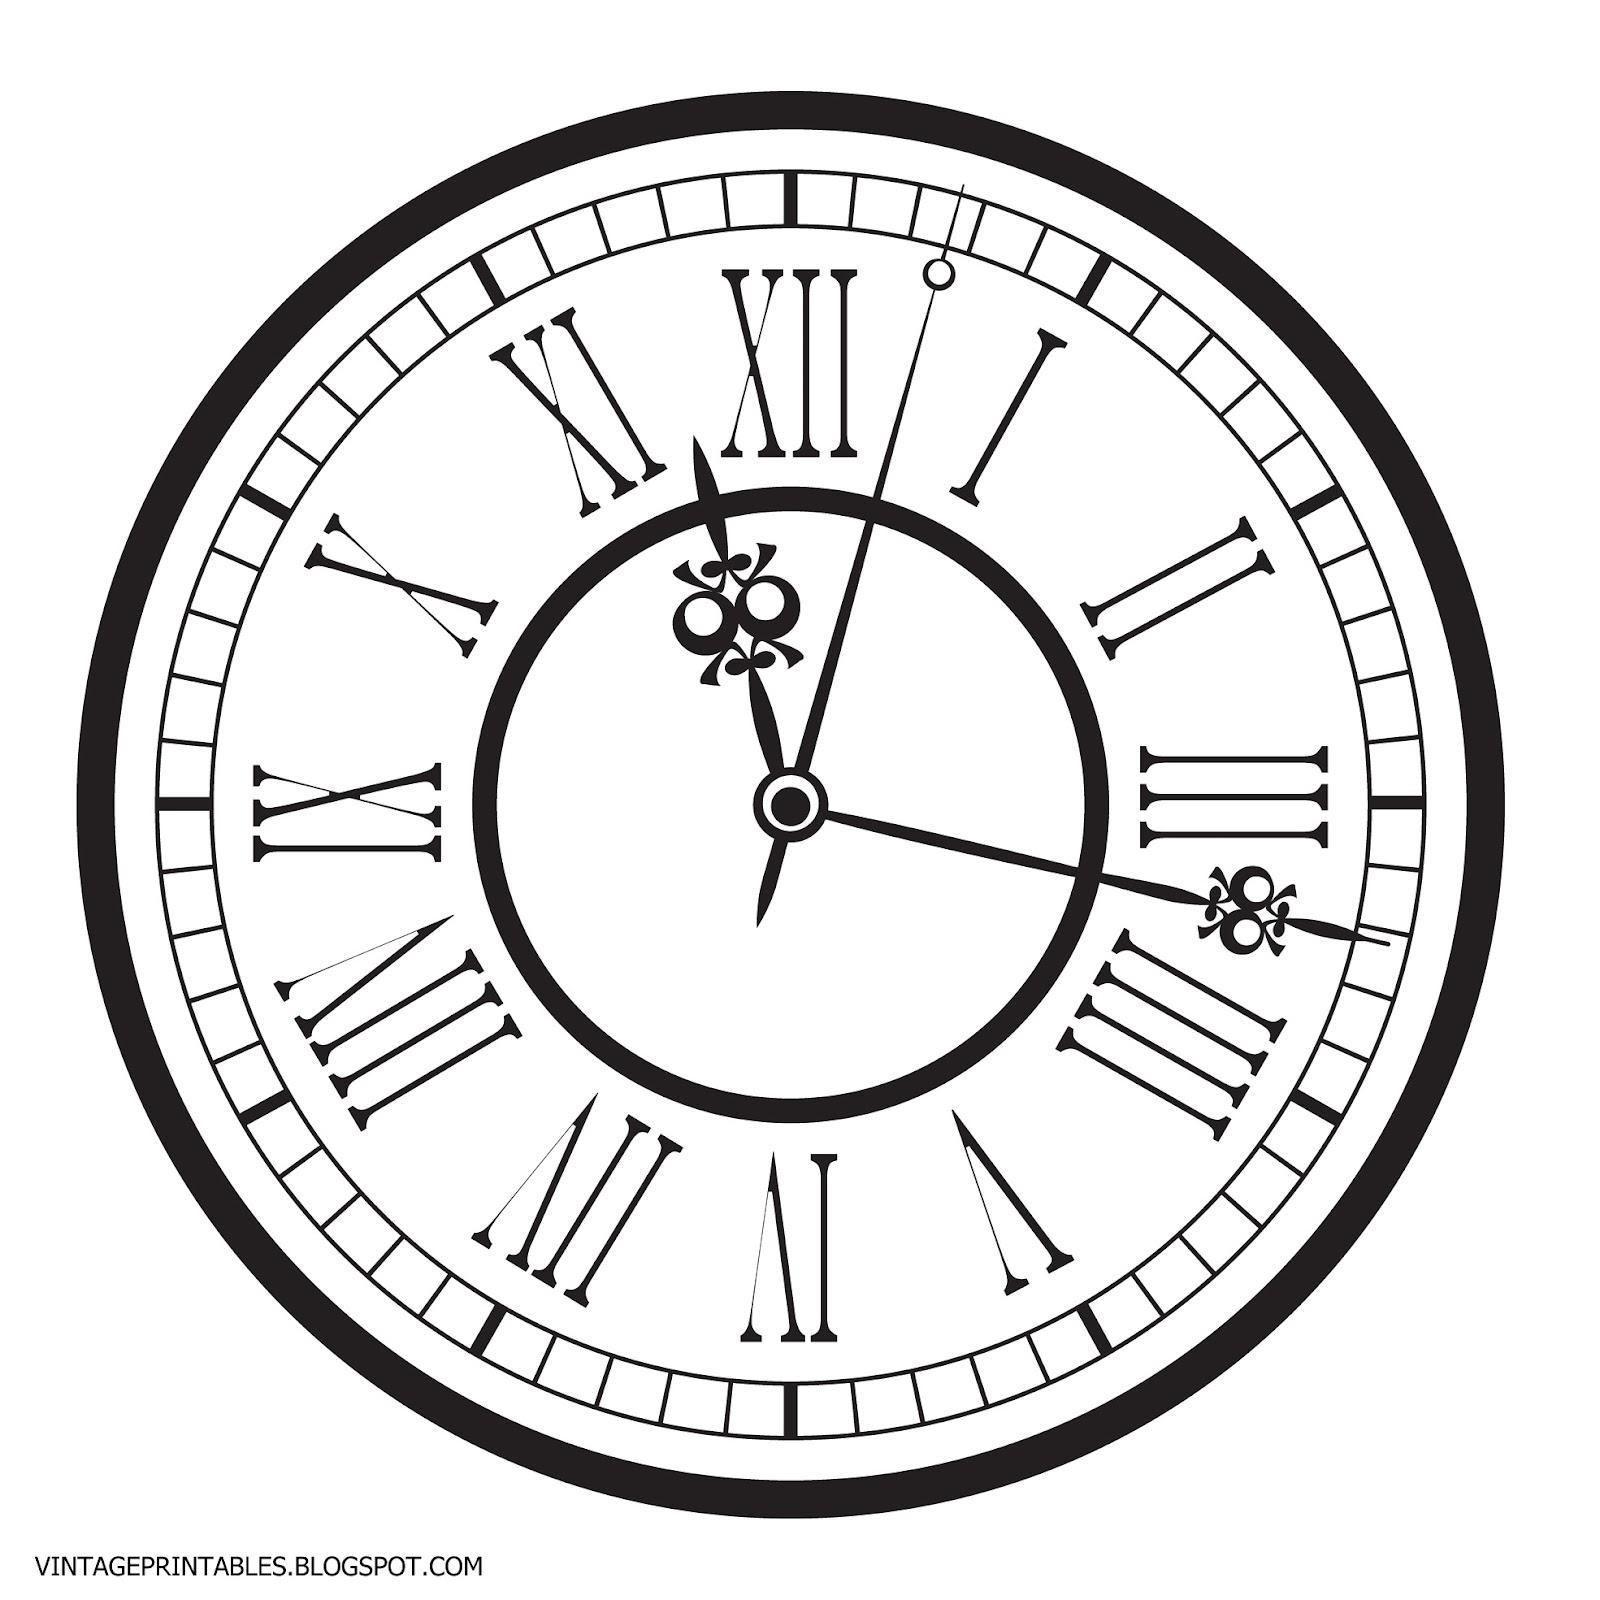 Steampunk clipart antique clock Free images:  My antique